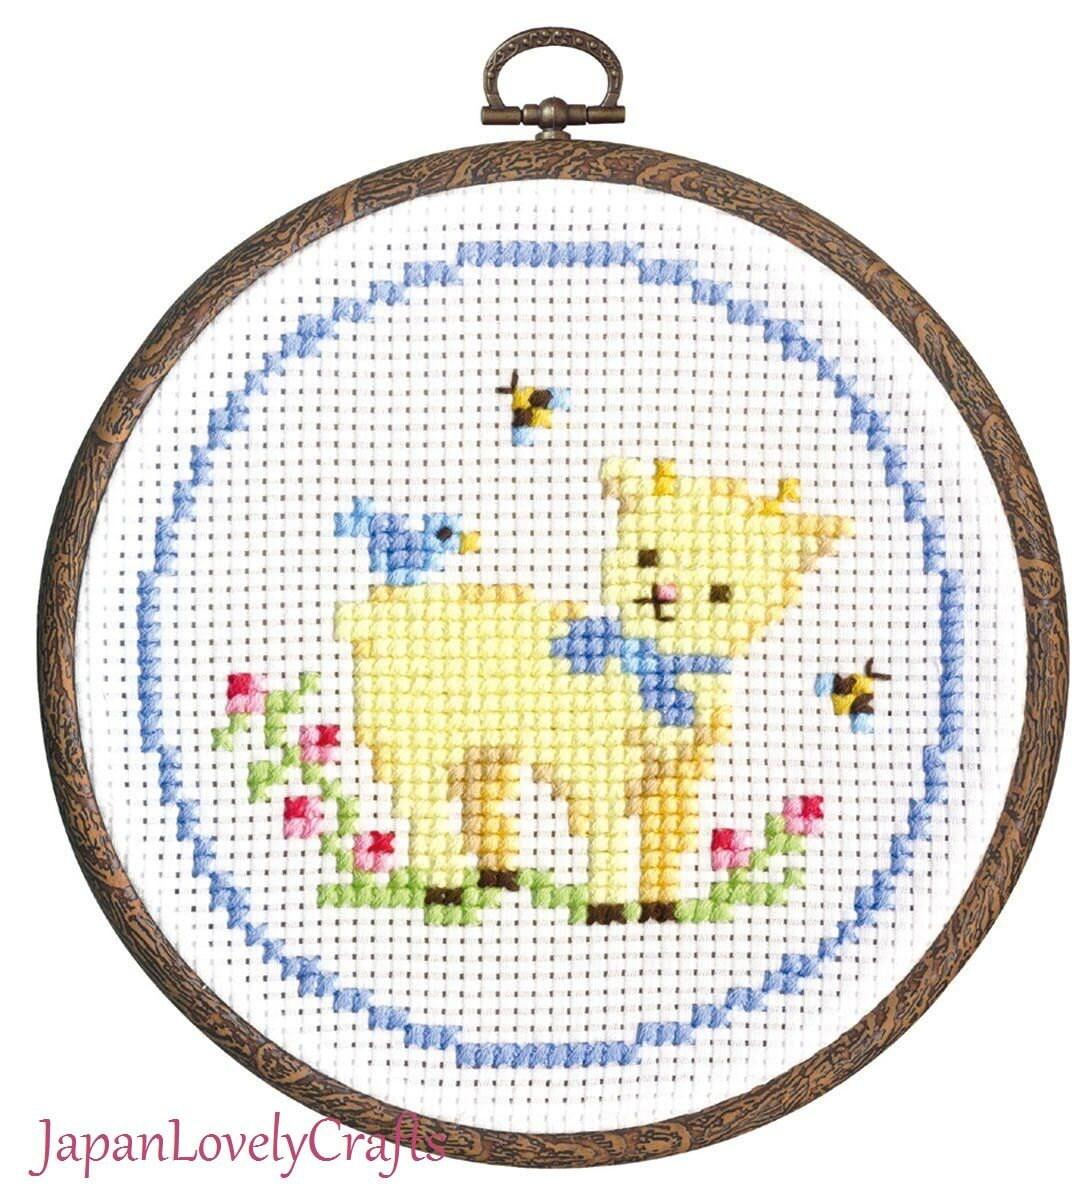 Japanese Counted Cross Stitch Kit Tutorial Kawaii Baby Goat &